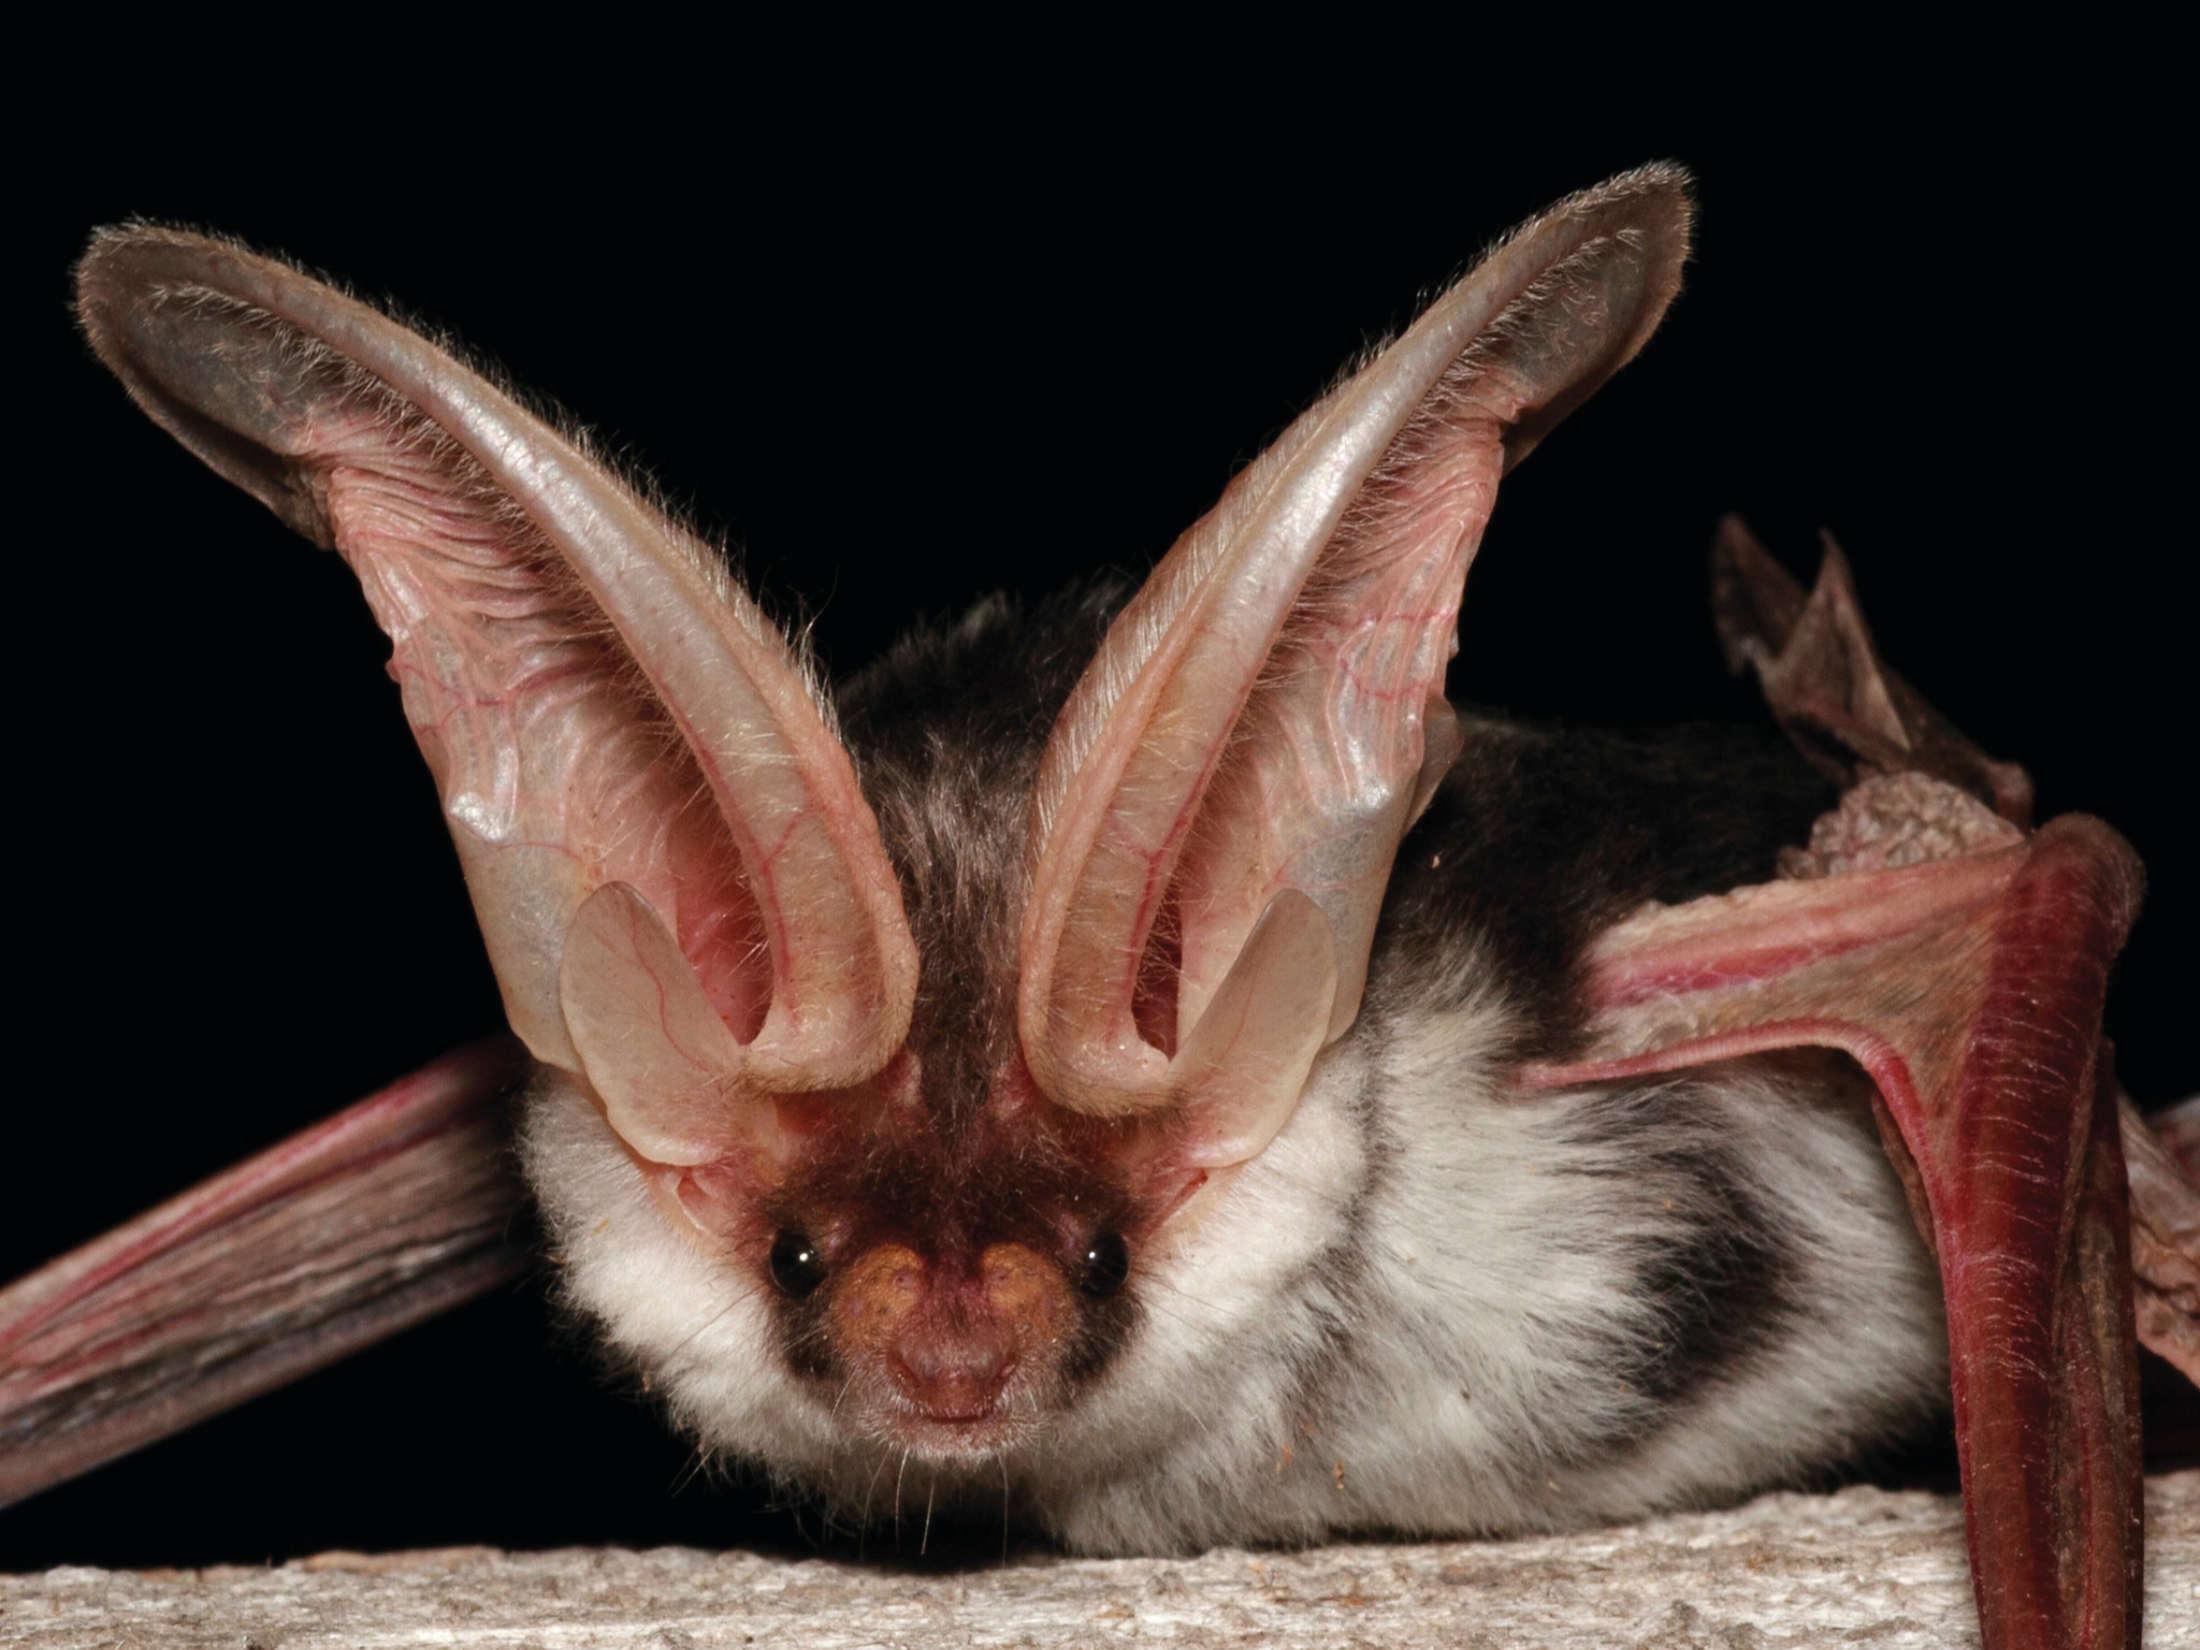 Grote oren, spotted bat, Noord Amerika, Bat Conservation International, Minden Pictures, Flickr CC lic.